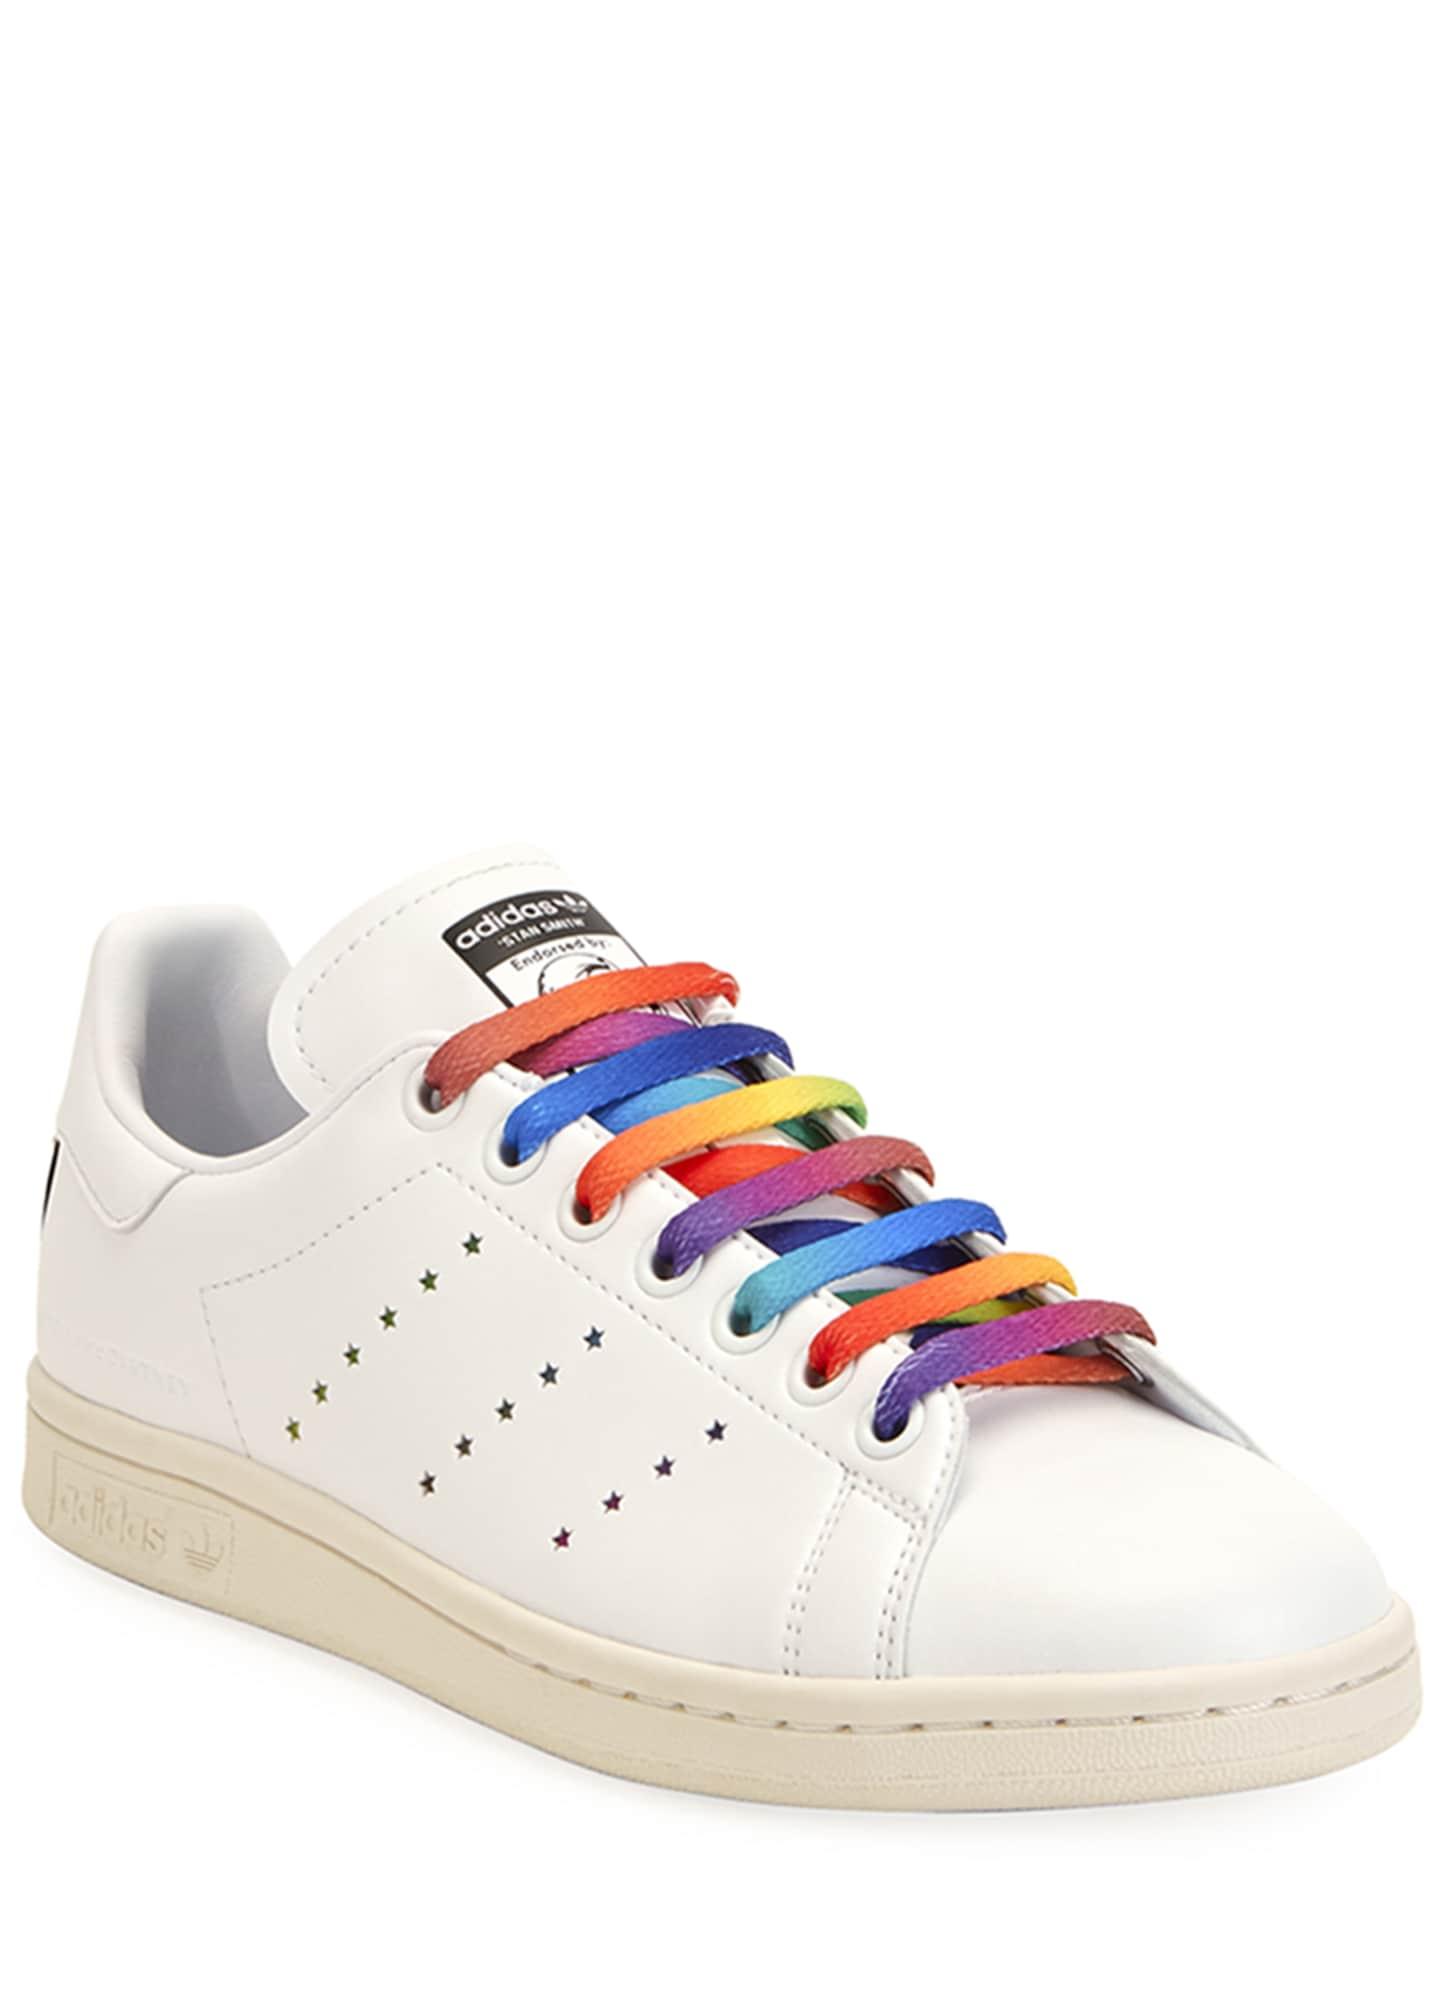 stan smith adidas rainbow